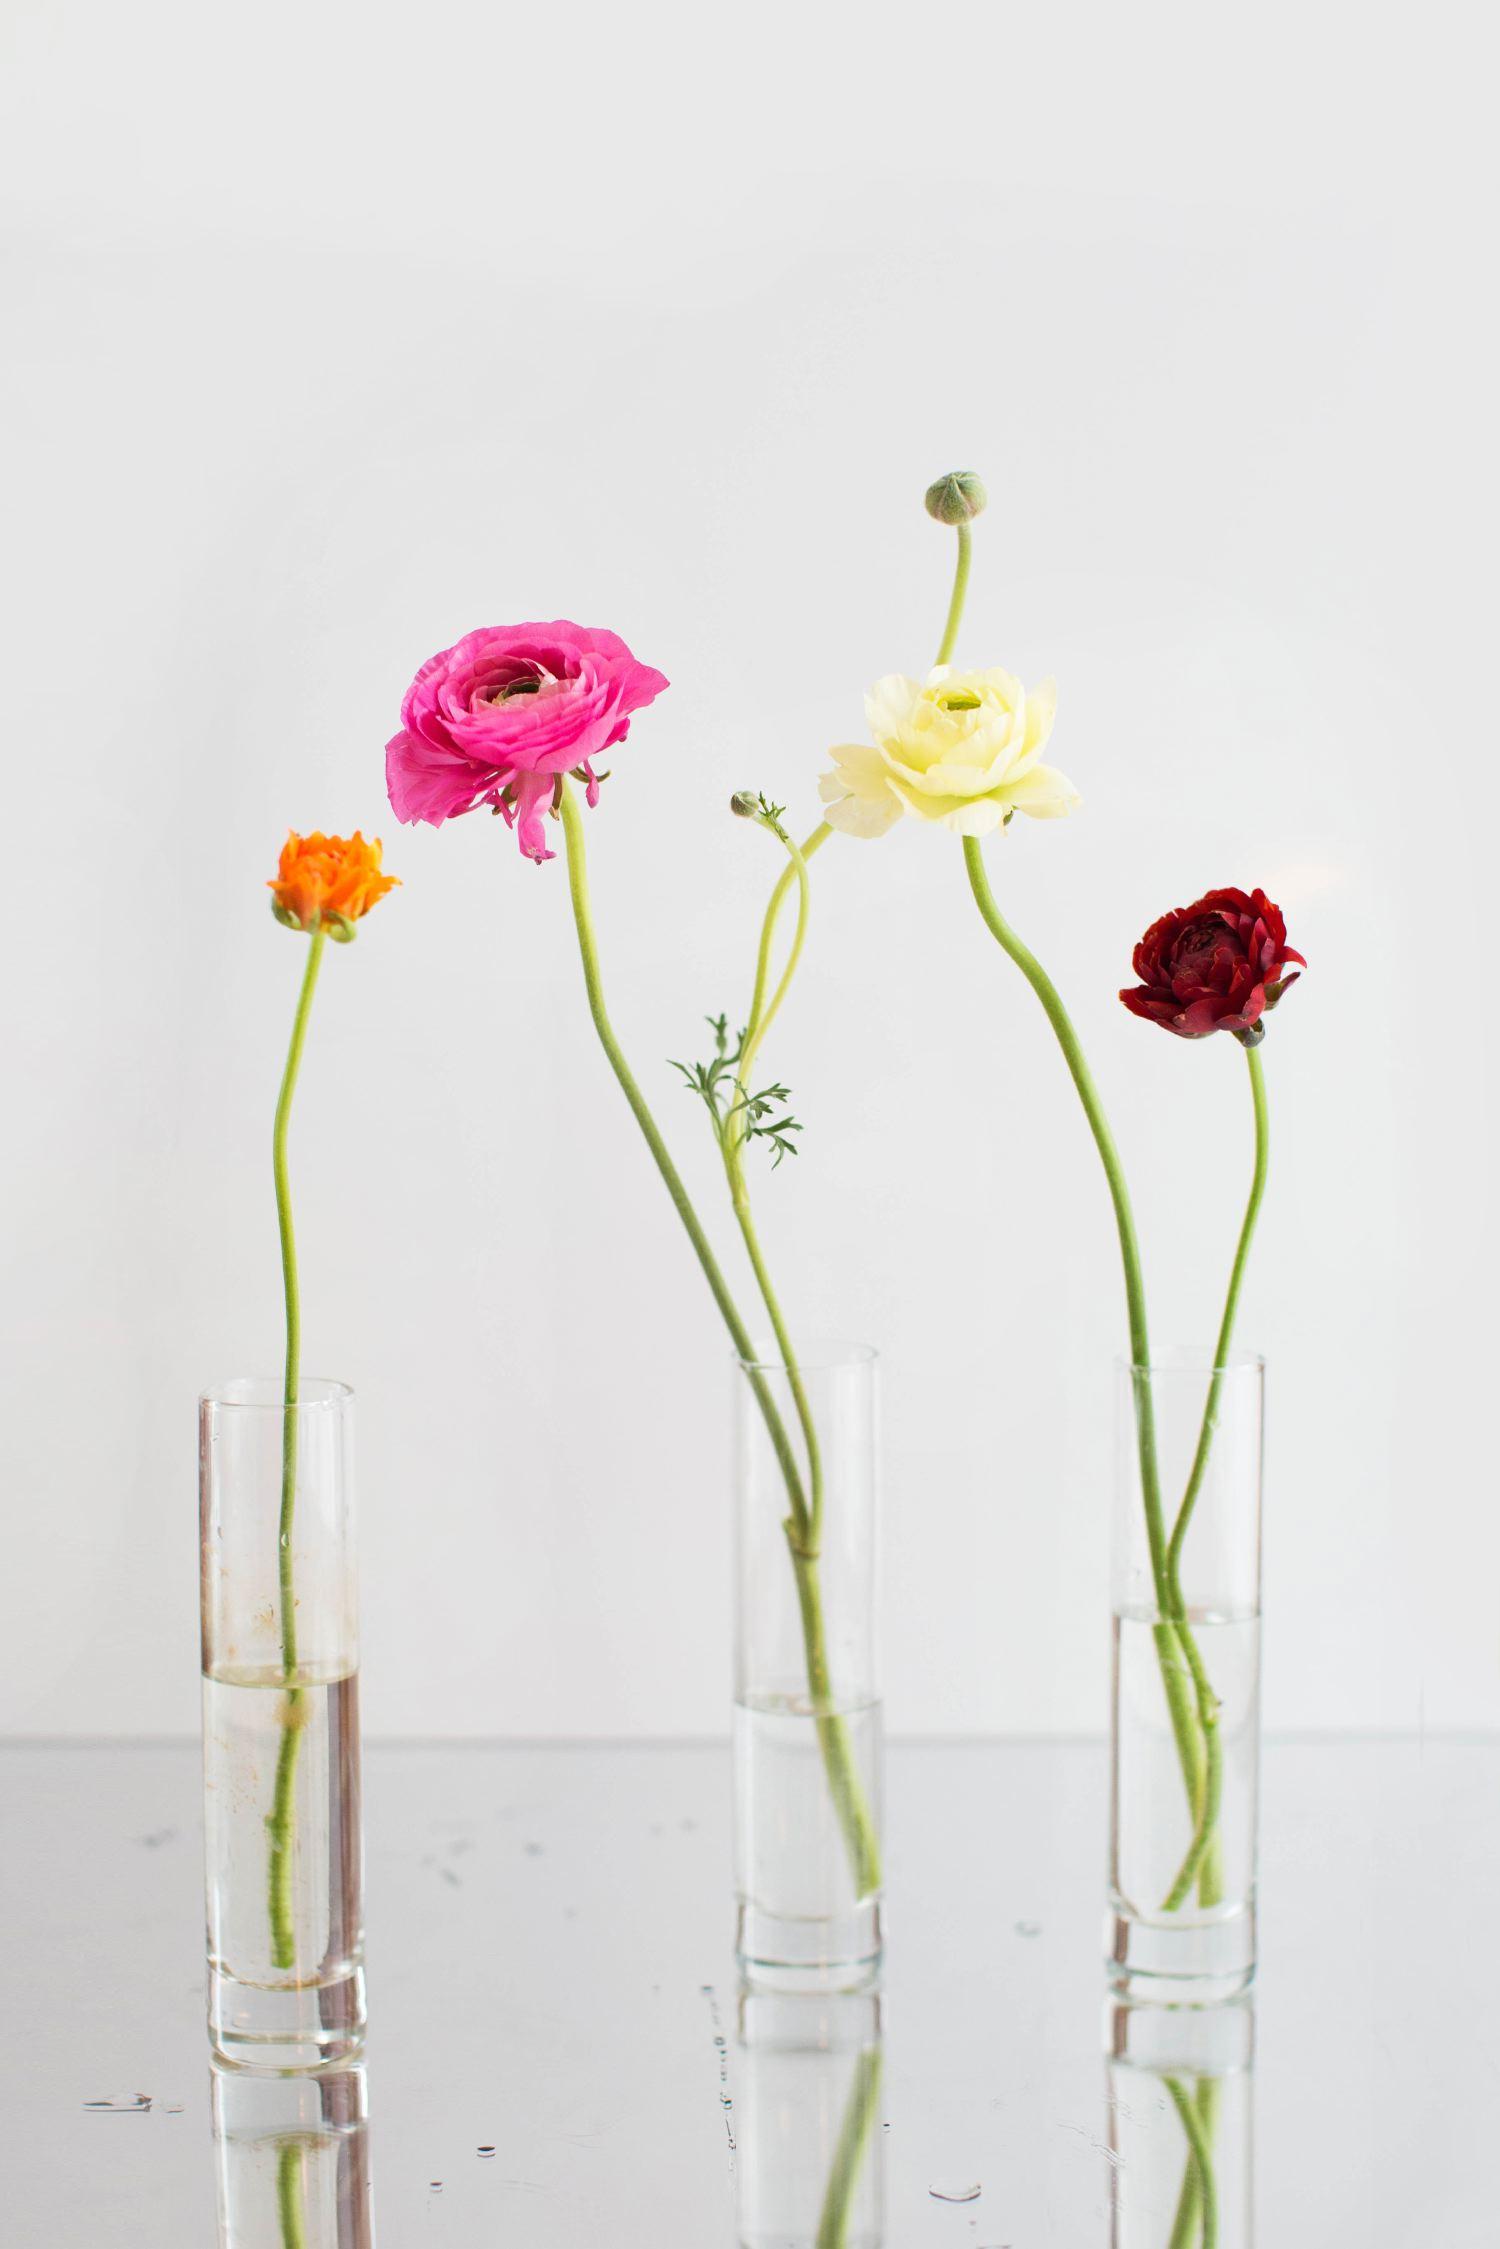 Spring Floral Portraits | You've Got Flair